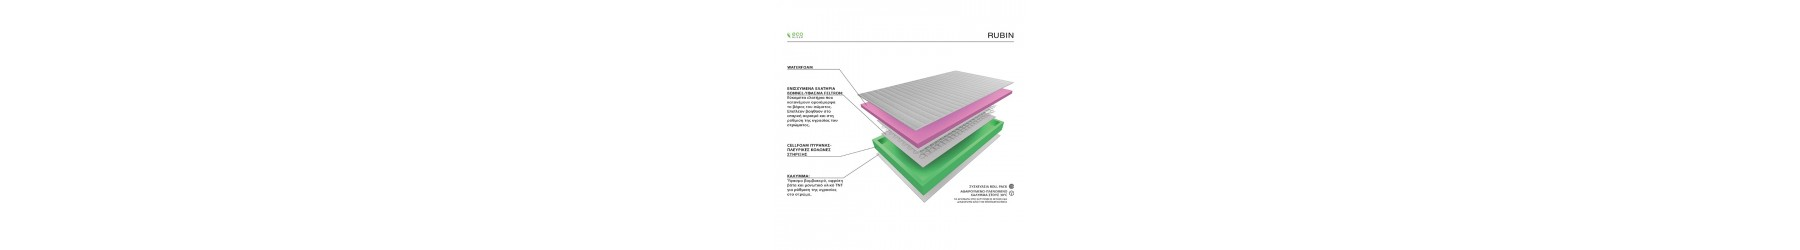 RUBBIN Στρώματα με ανατομικό και ορθοπεδικό σχεδιασμό